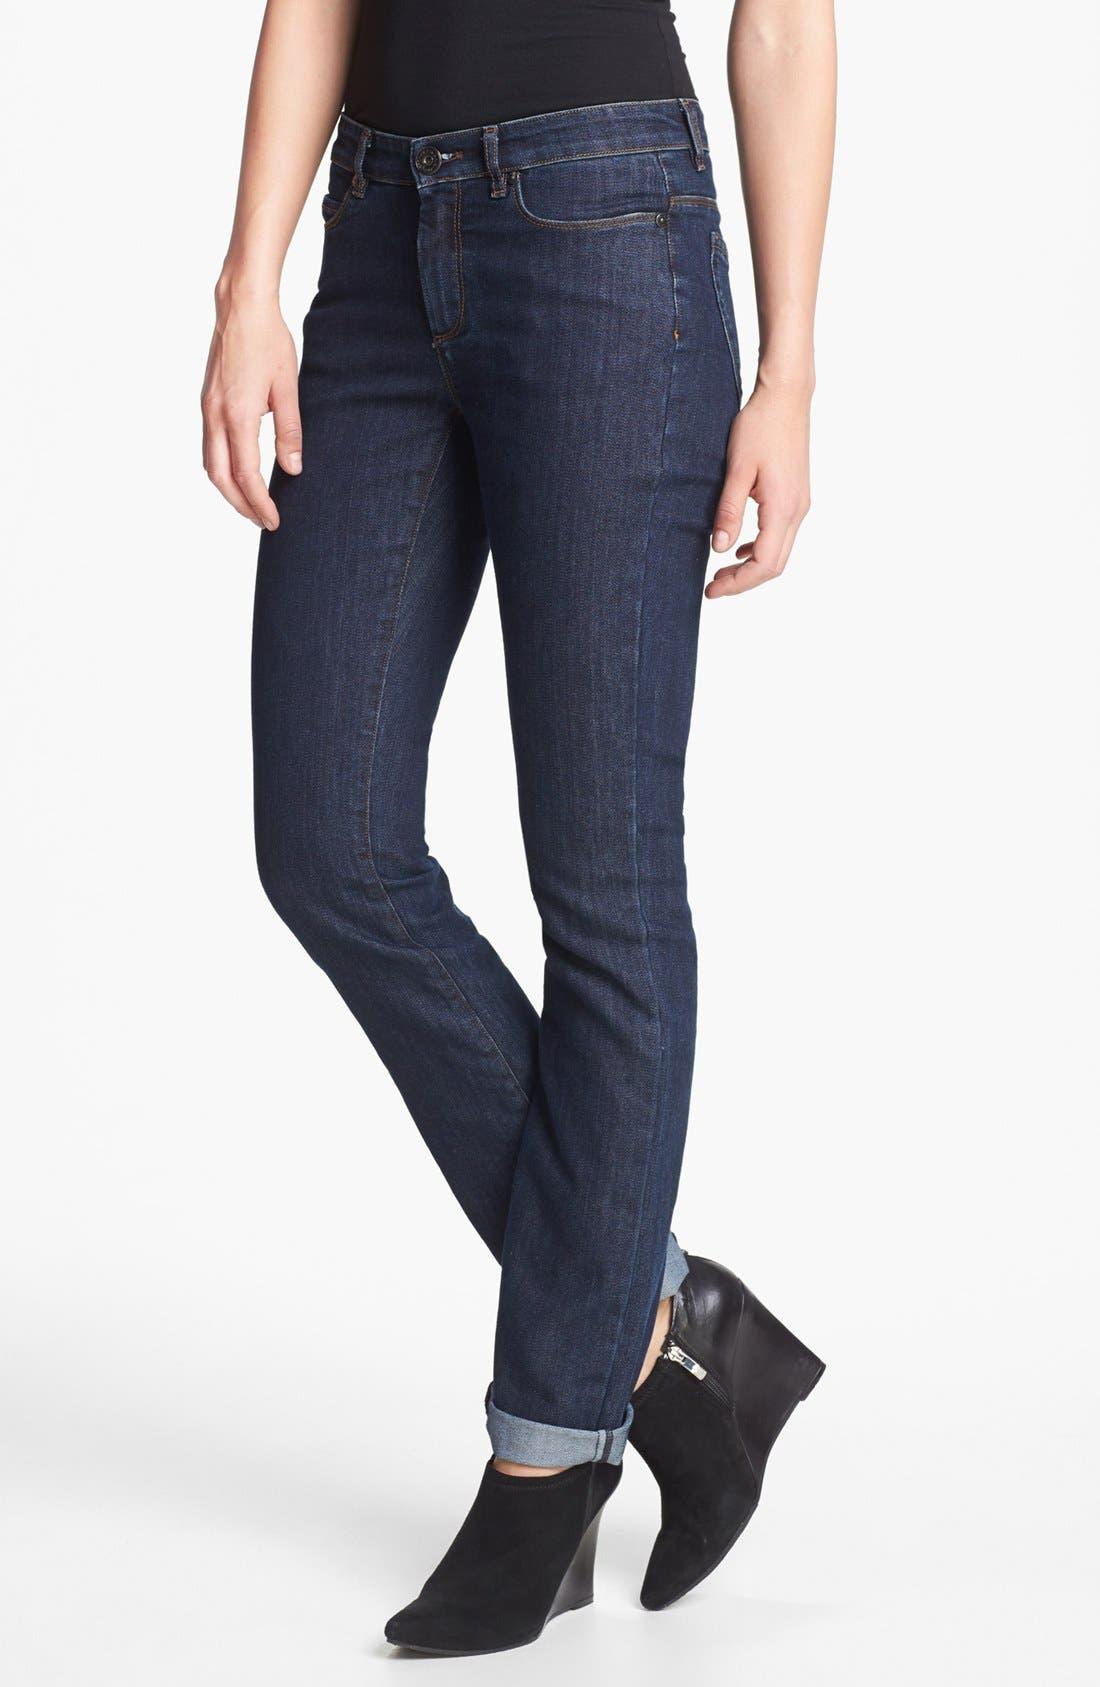 Alternate Image 1 Selected - Weekend Max Mara 'Crimea' Jeans